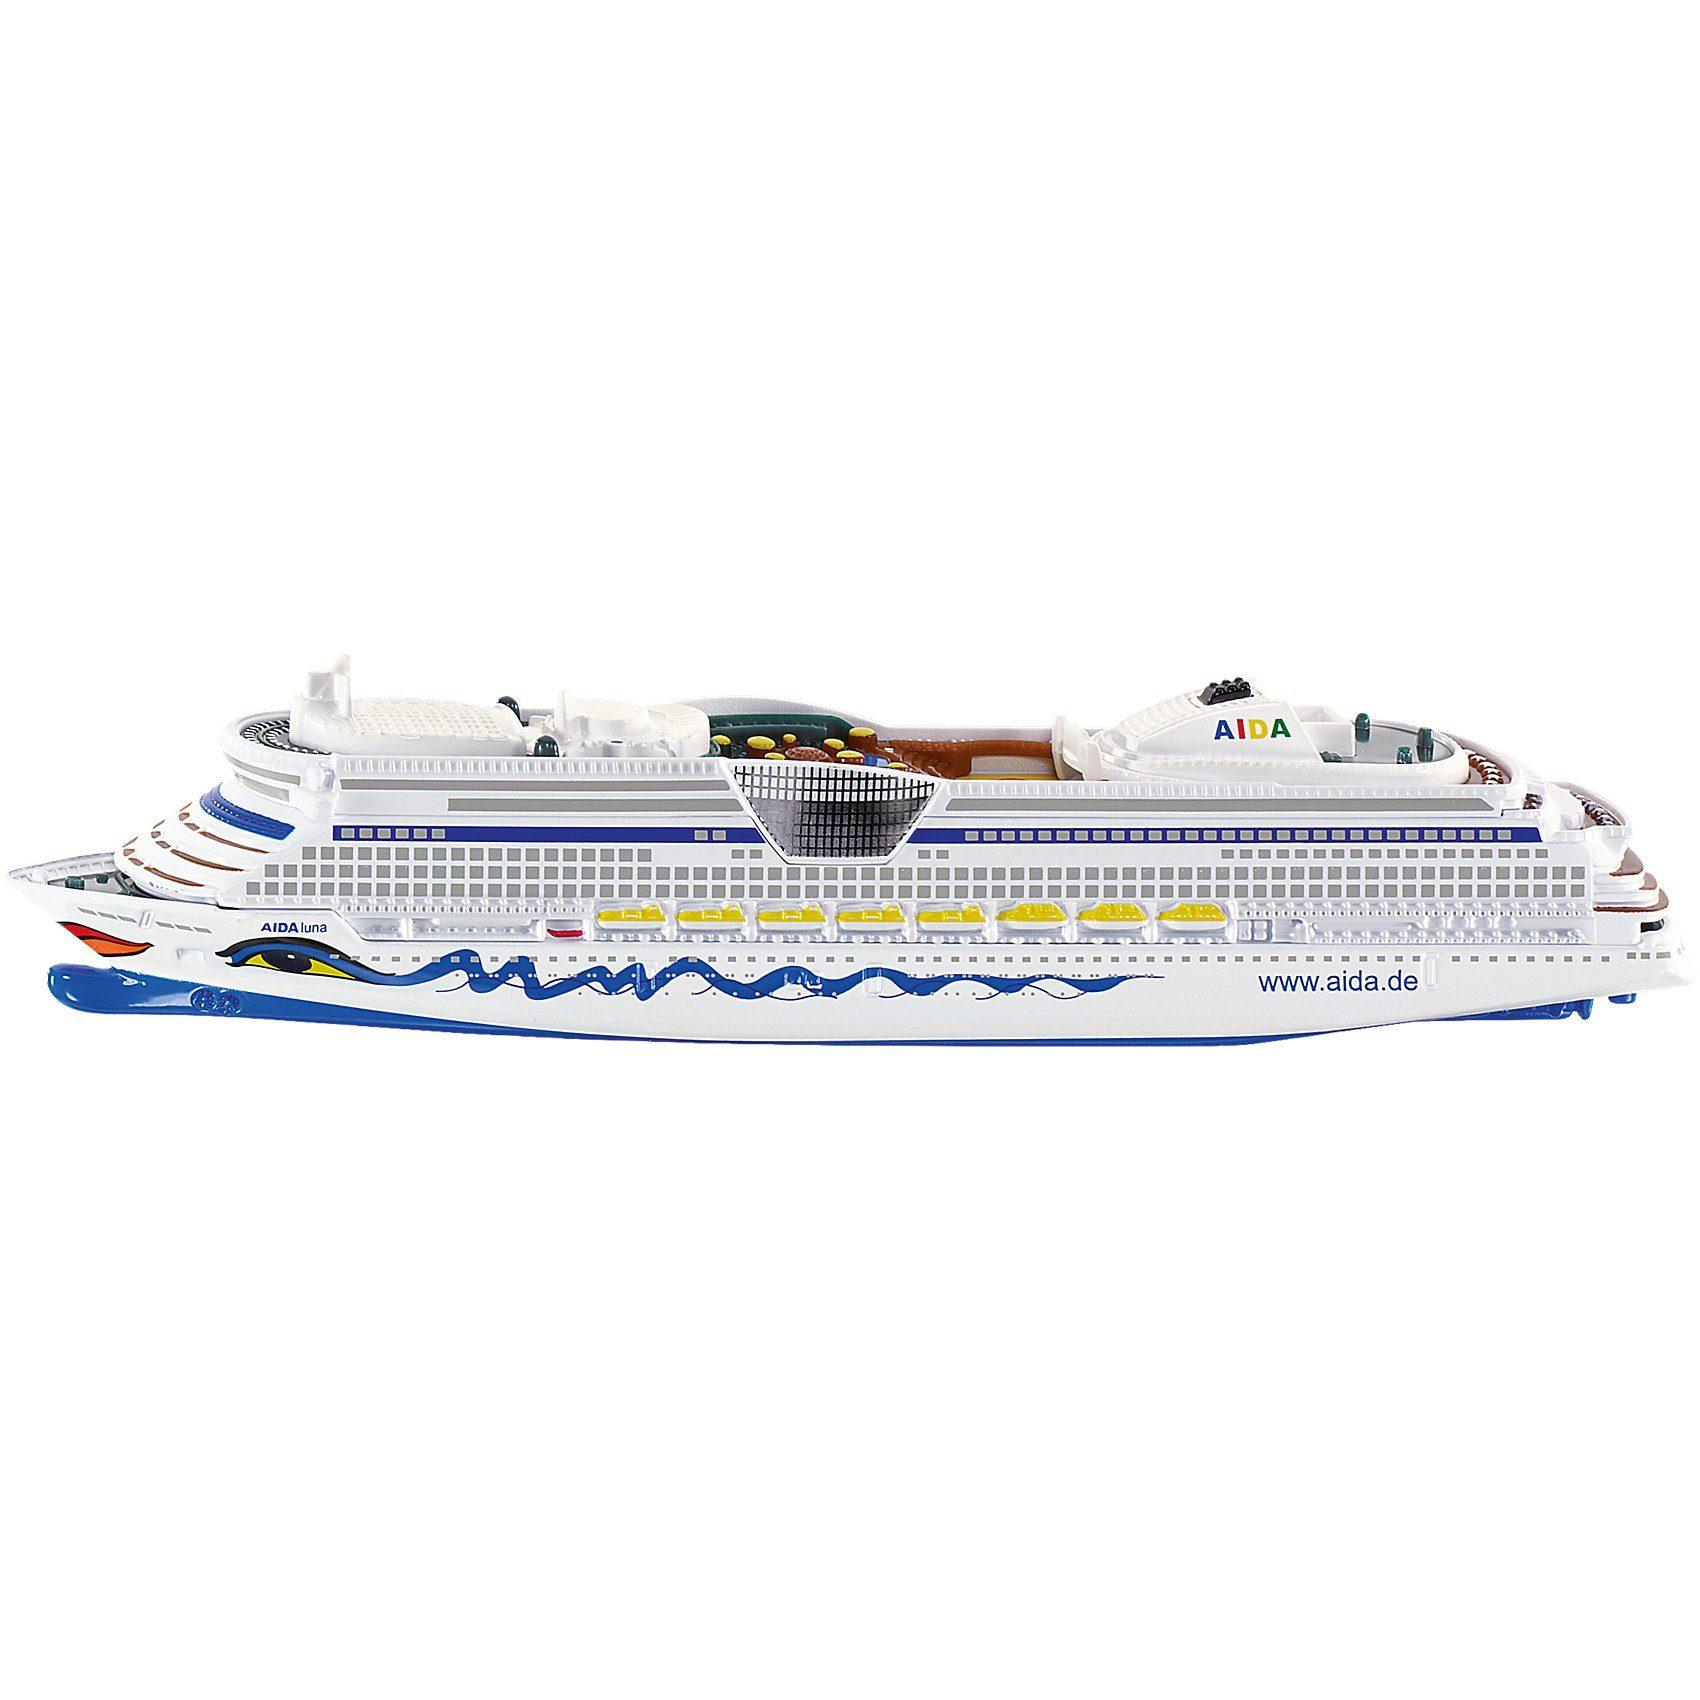 SIKU 1720 AIDA Kreuzfahrtschiff 1:1400